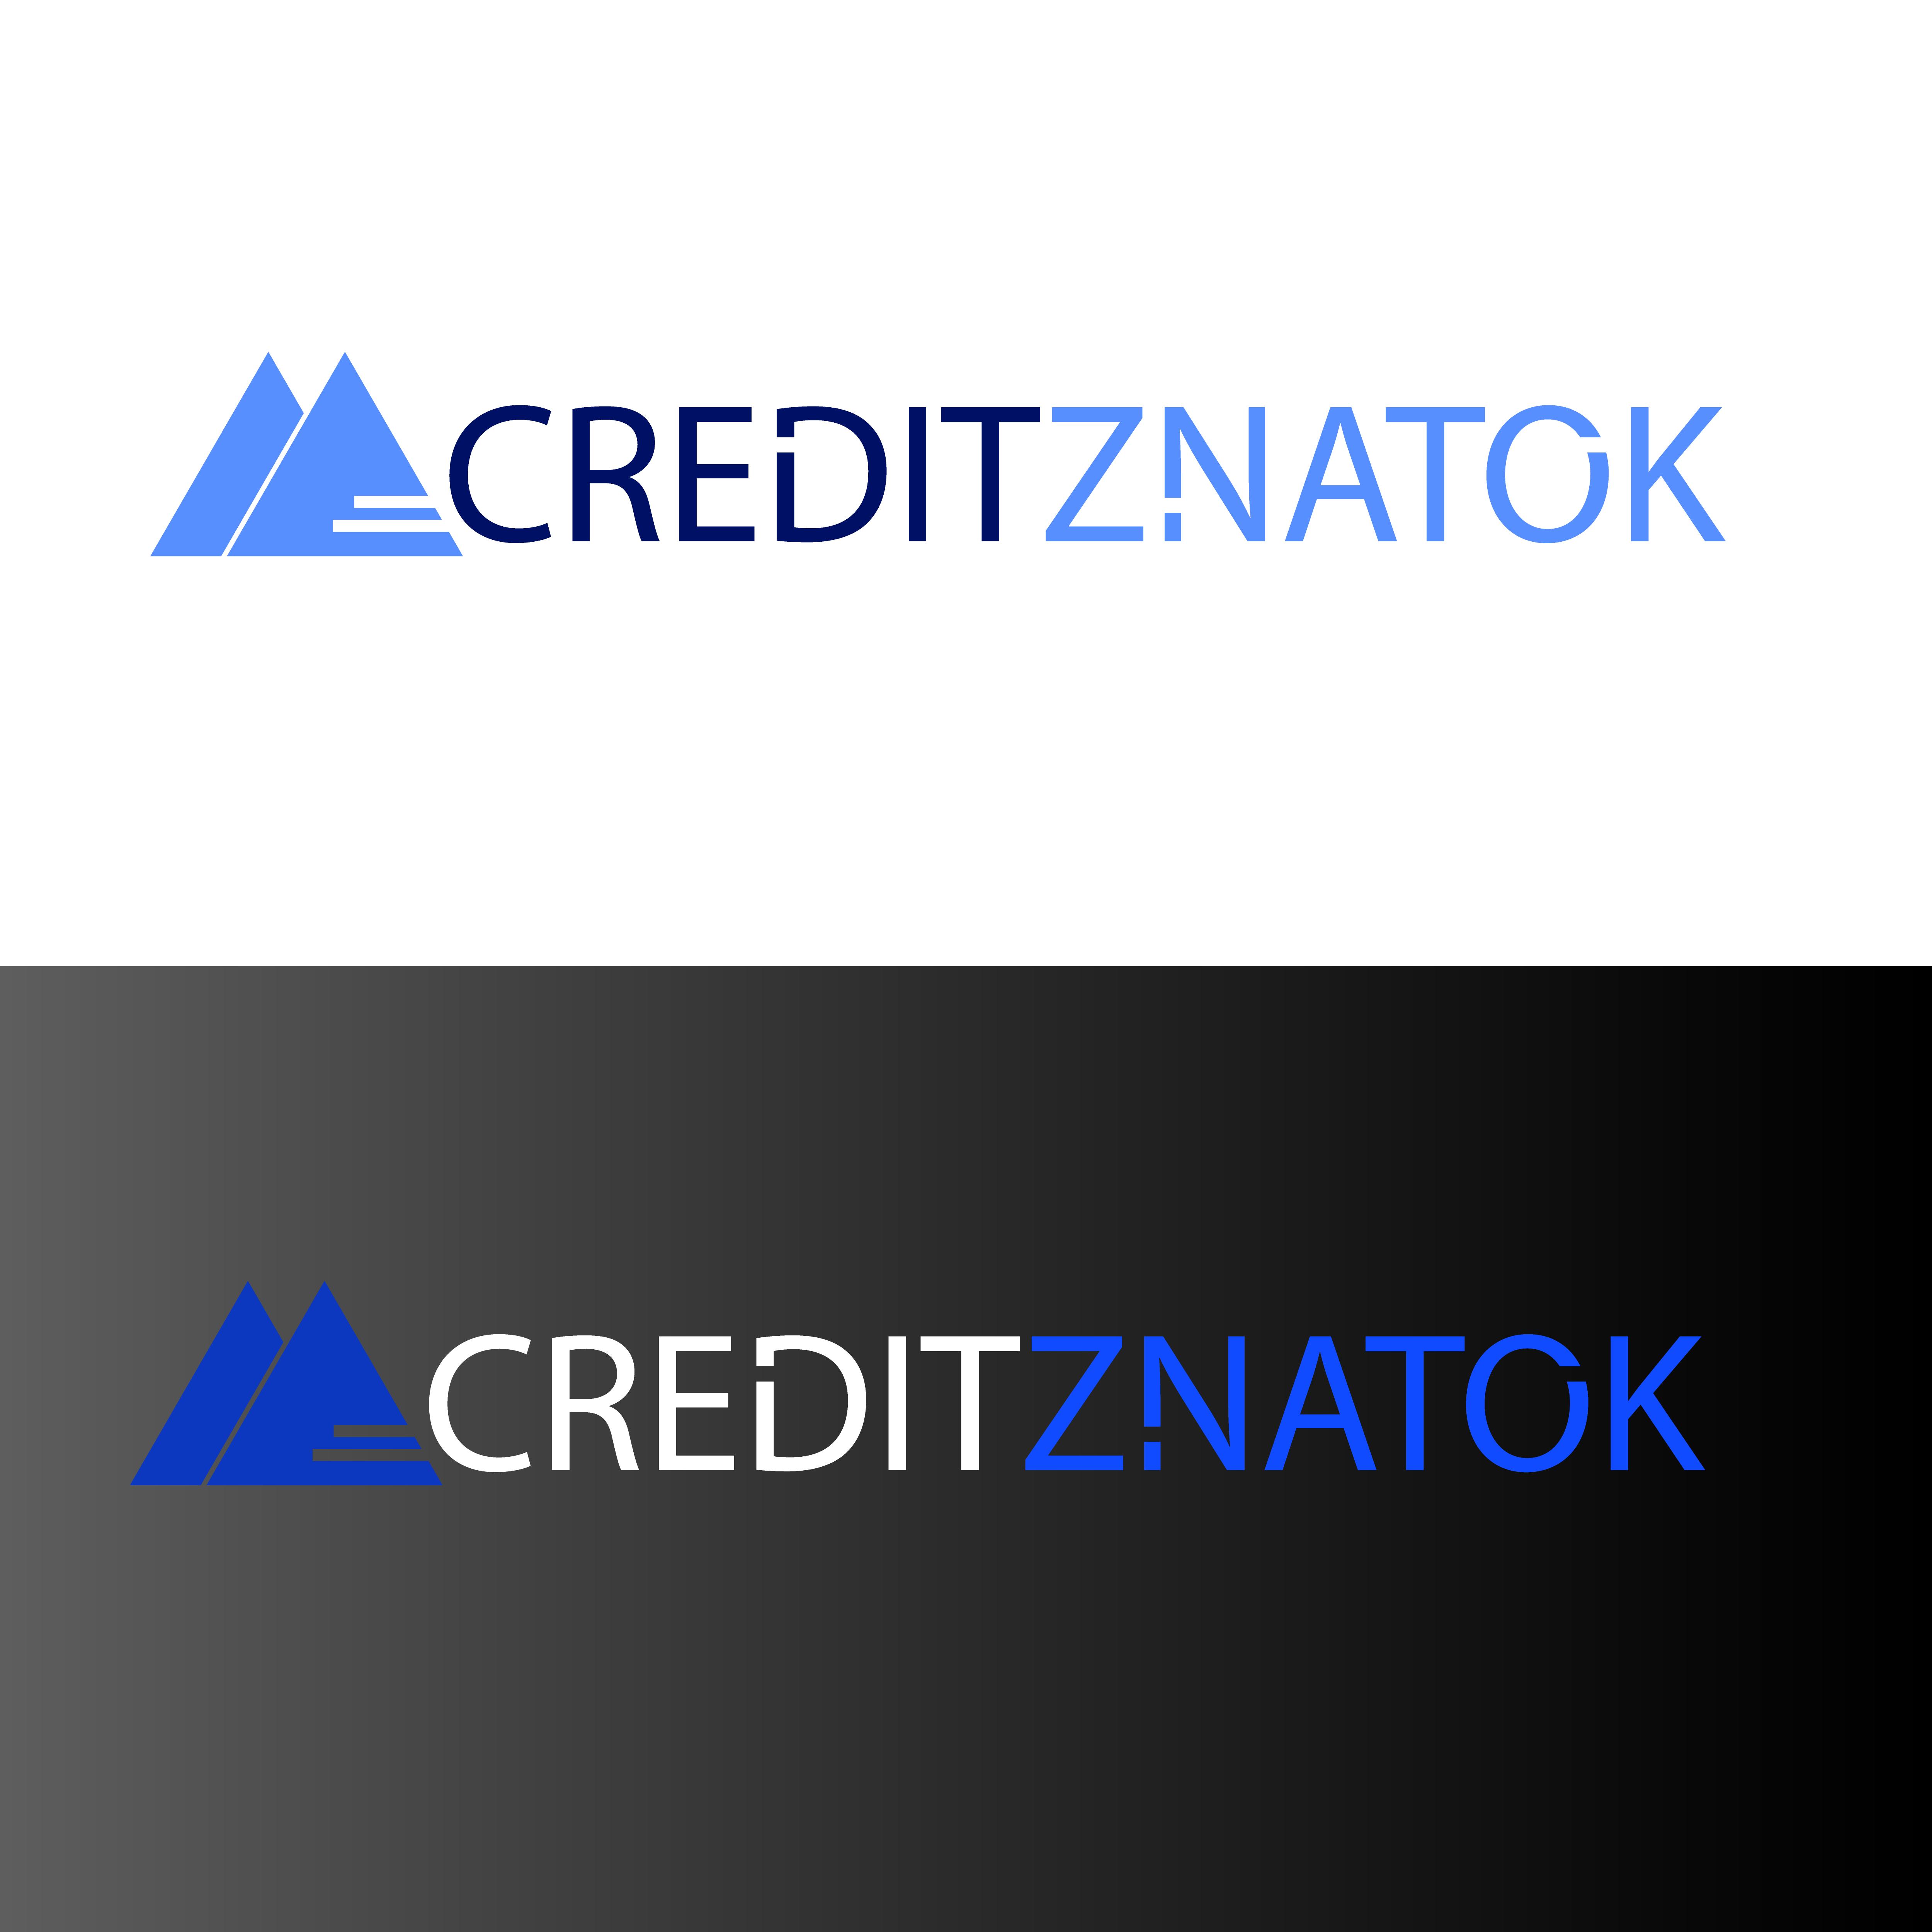 creditznatok.ru - логотип фото f_405589cc40515d1e.jpg